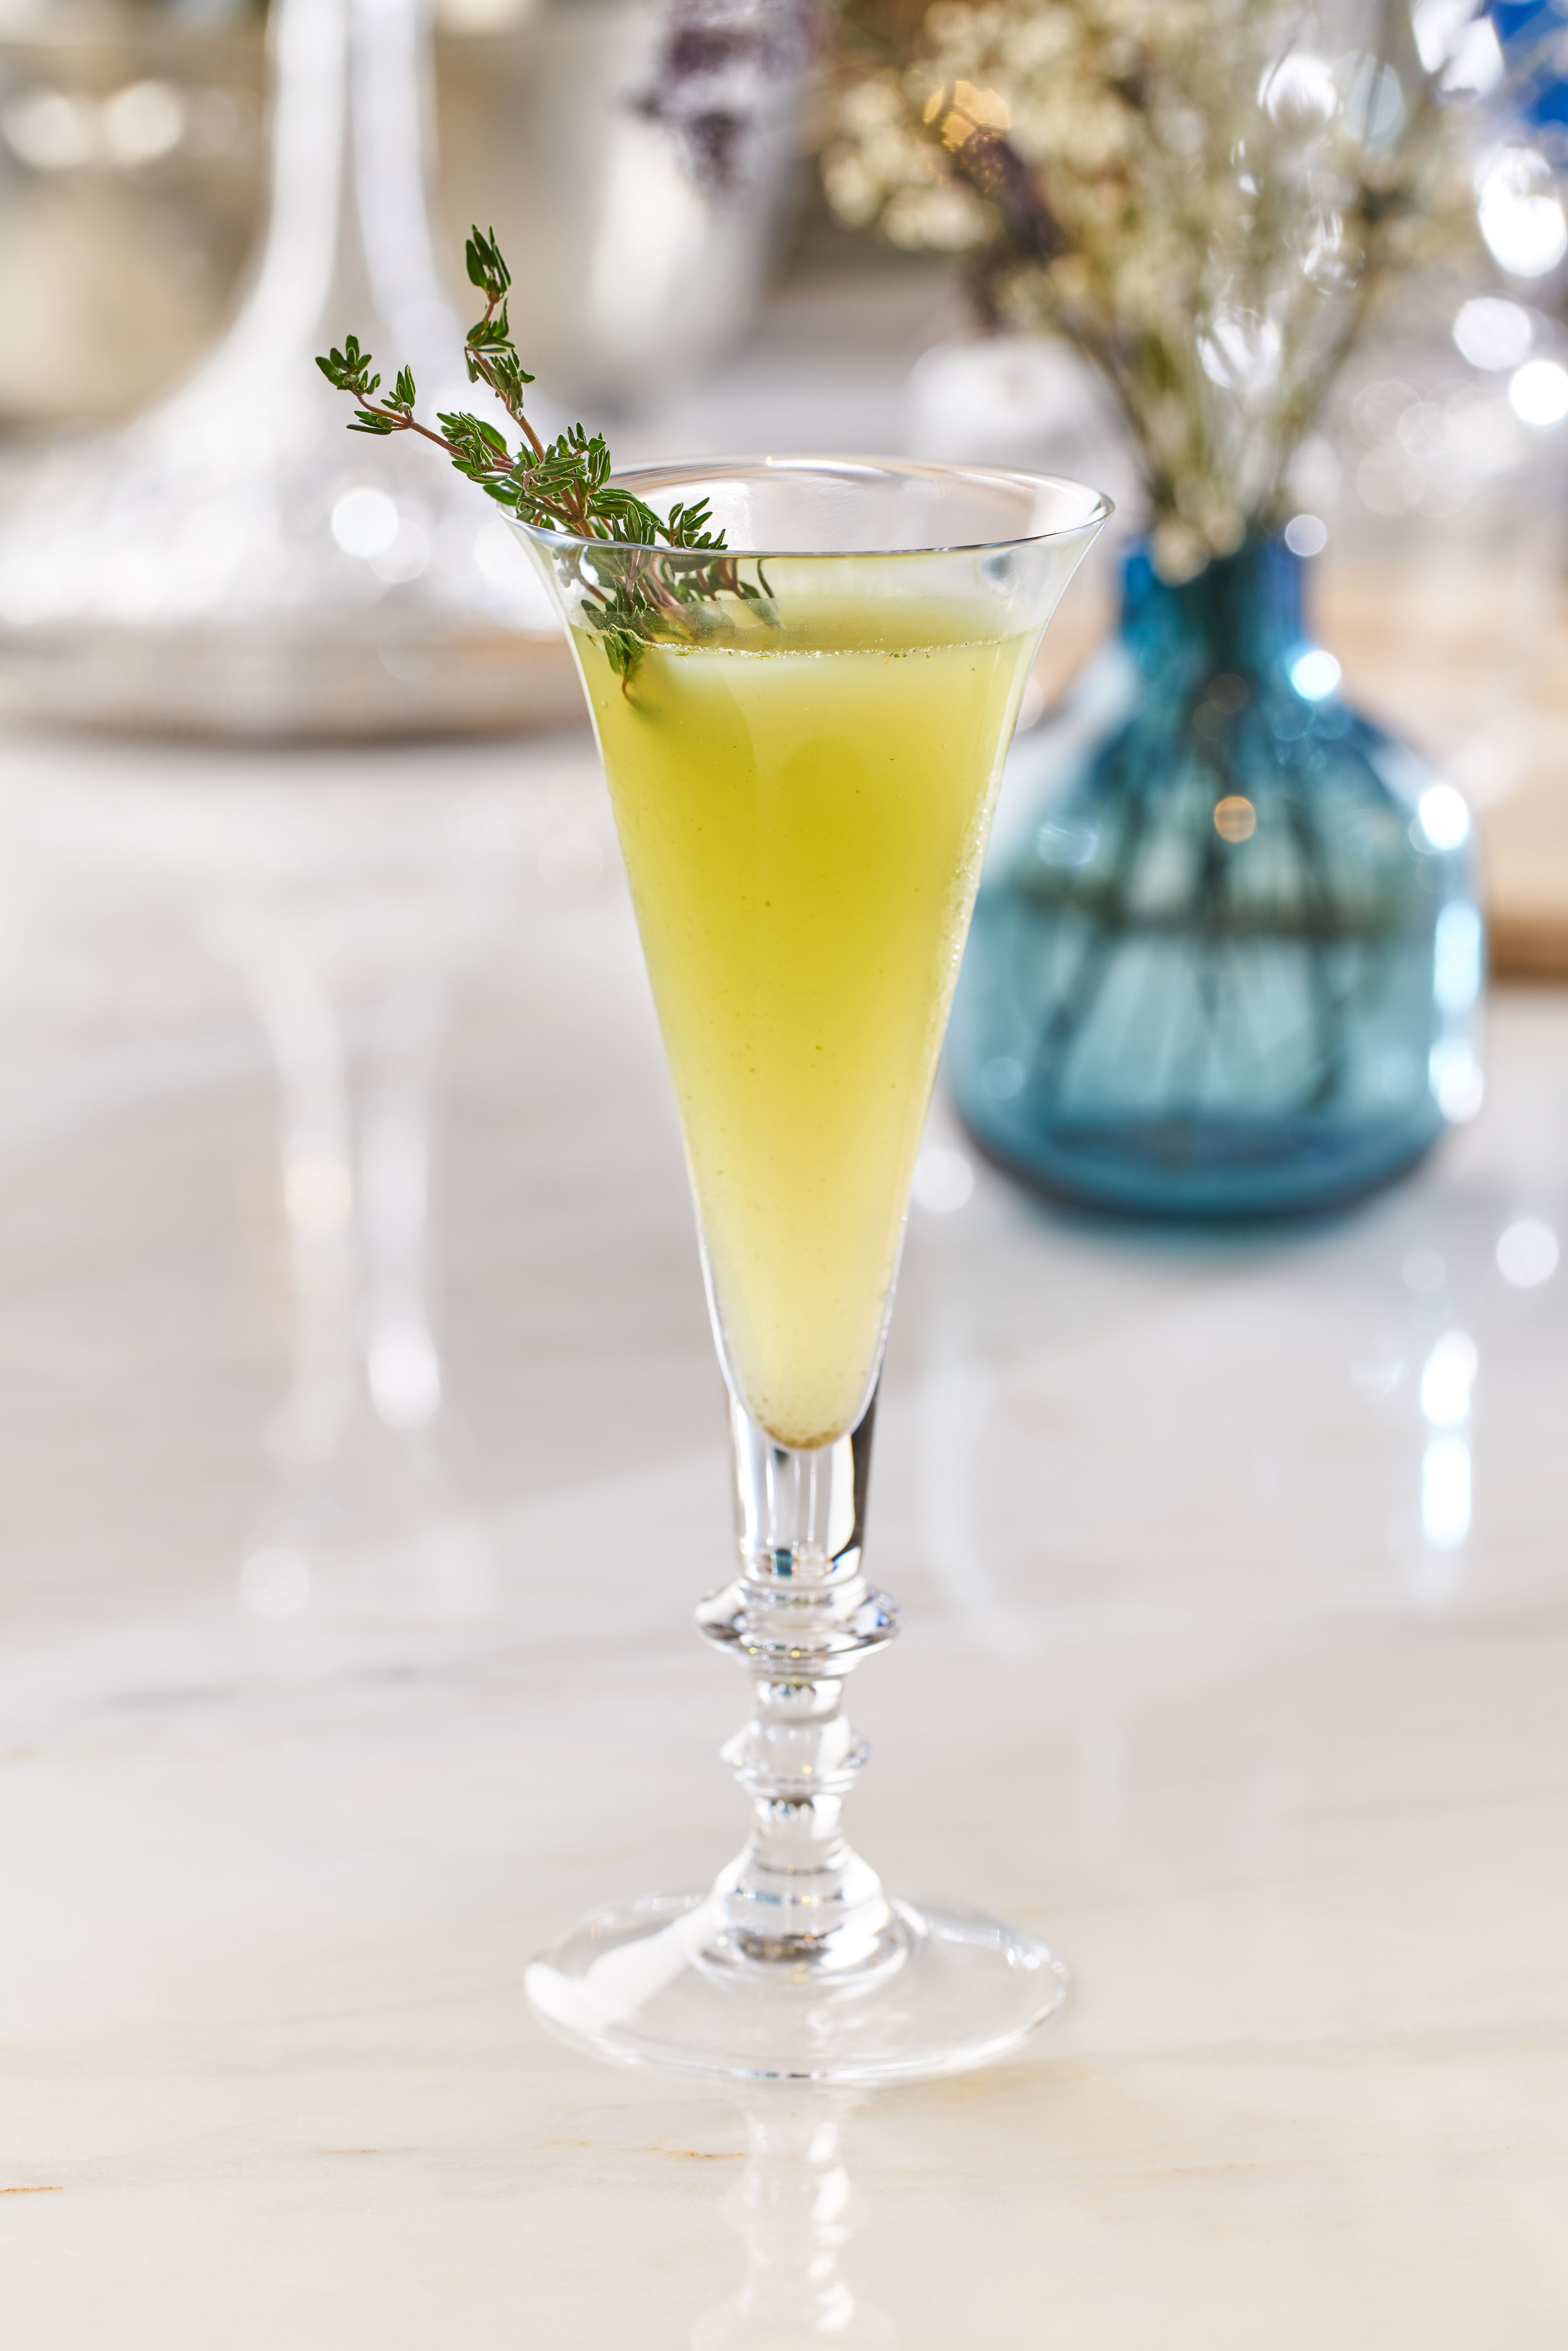 Cocktails at Bleu Blanc | Best Restaurants in Dubai